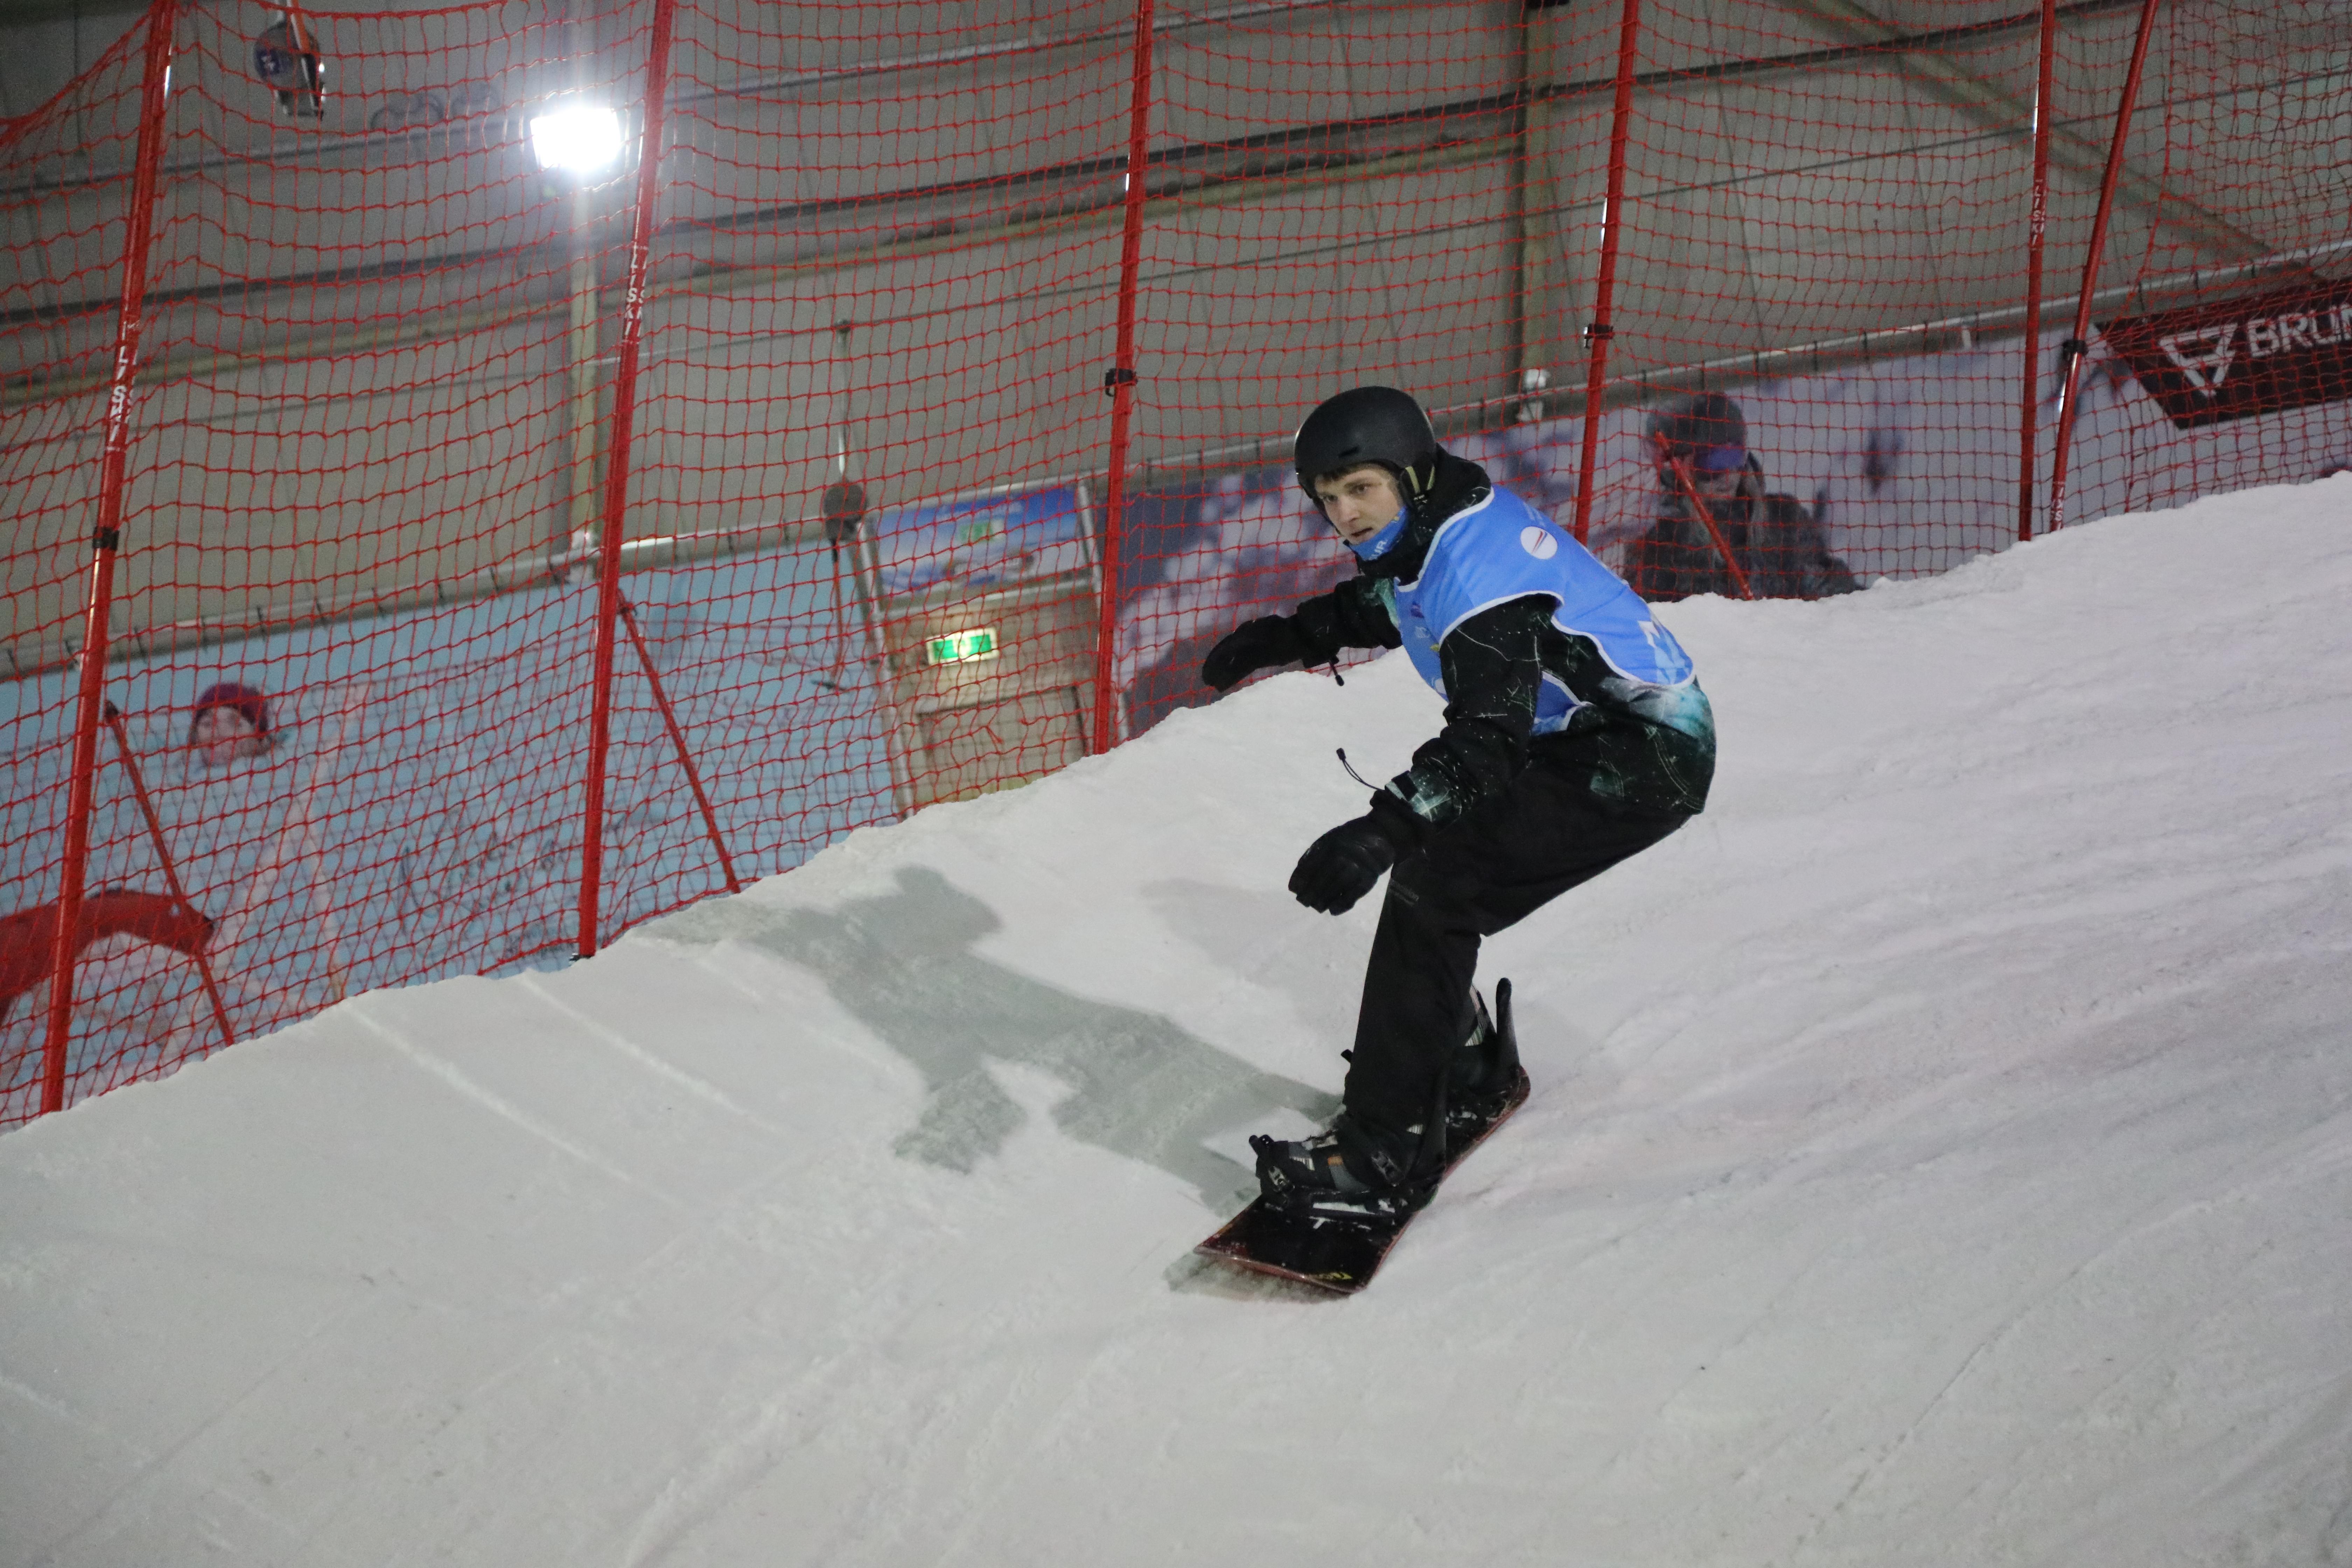 wagner_snowboard.jpg